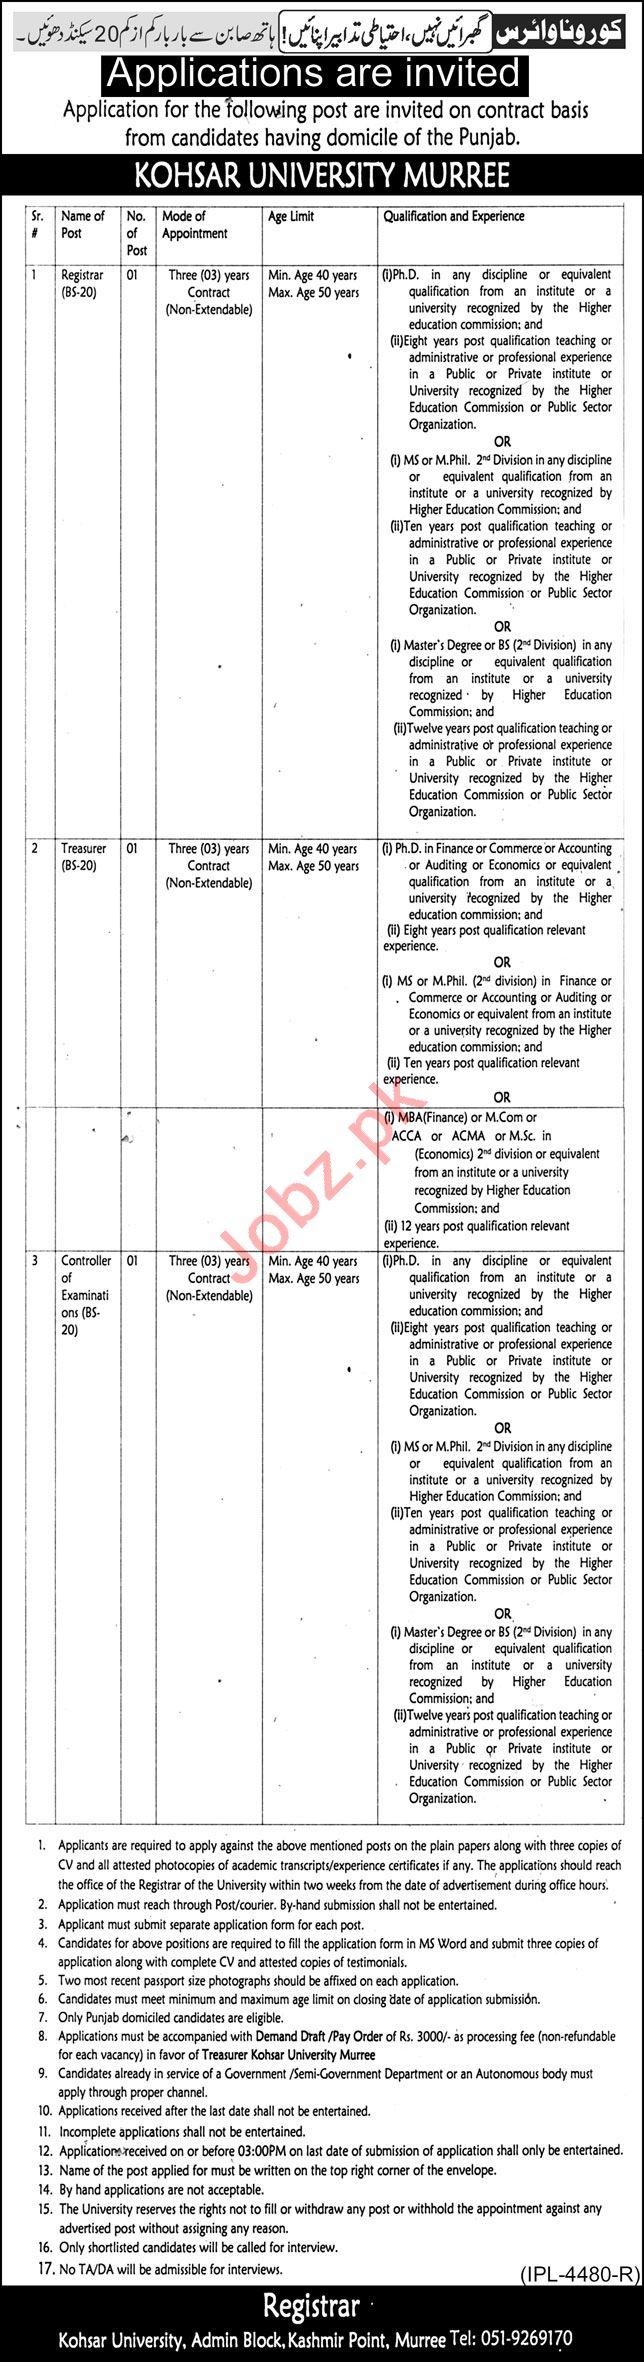 Kohsar University Murree KUM Jobs 2021 Registrar & Treasurer